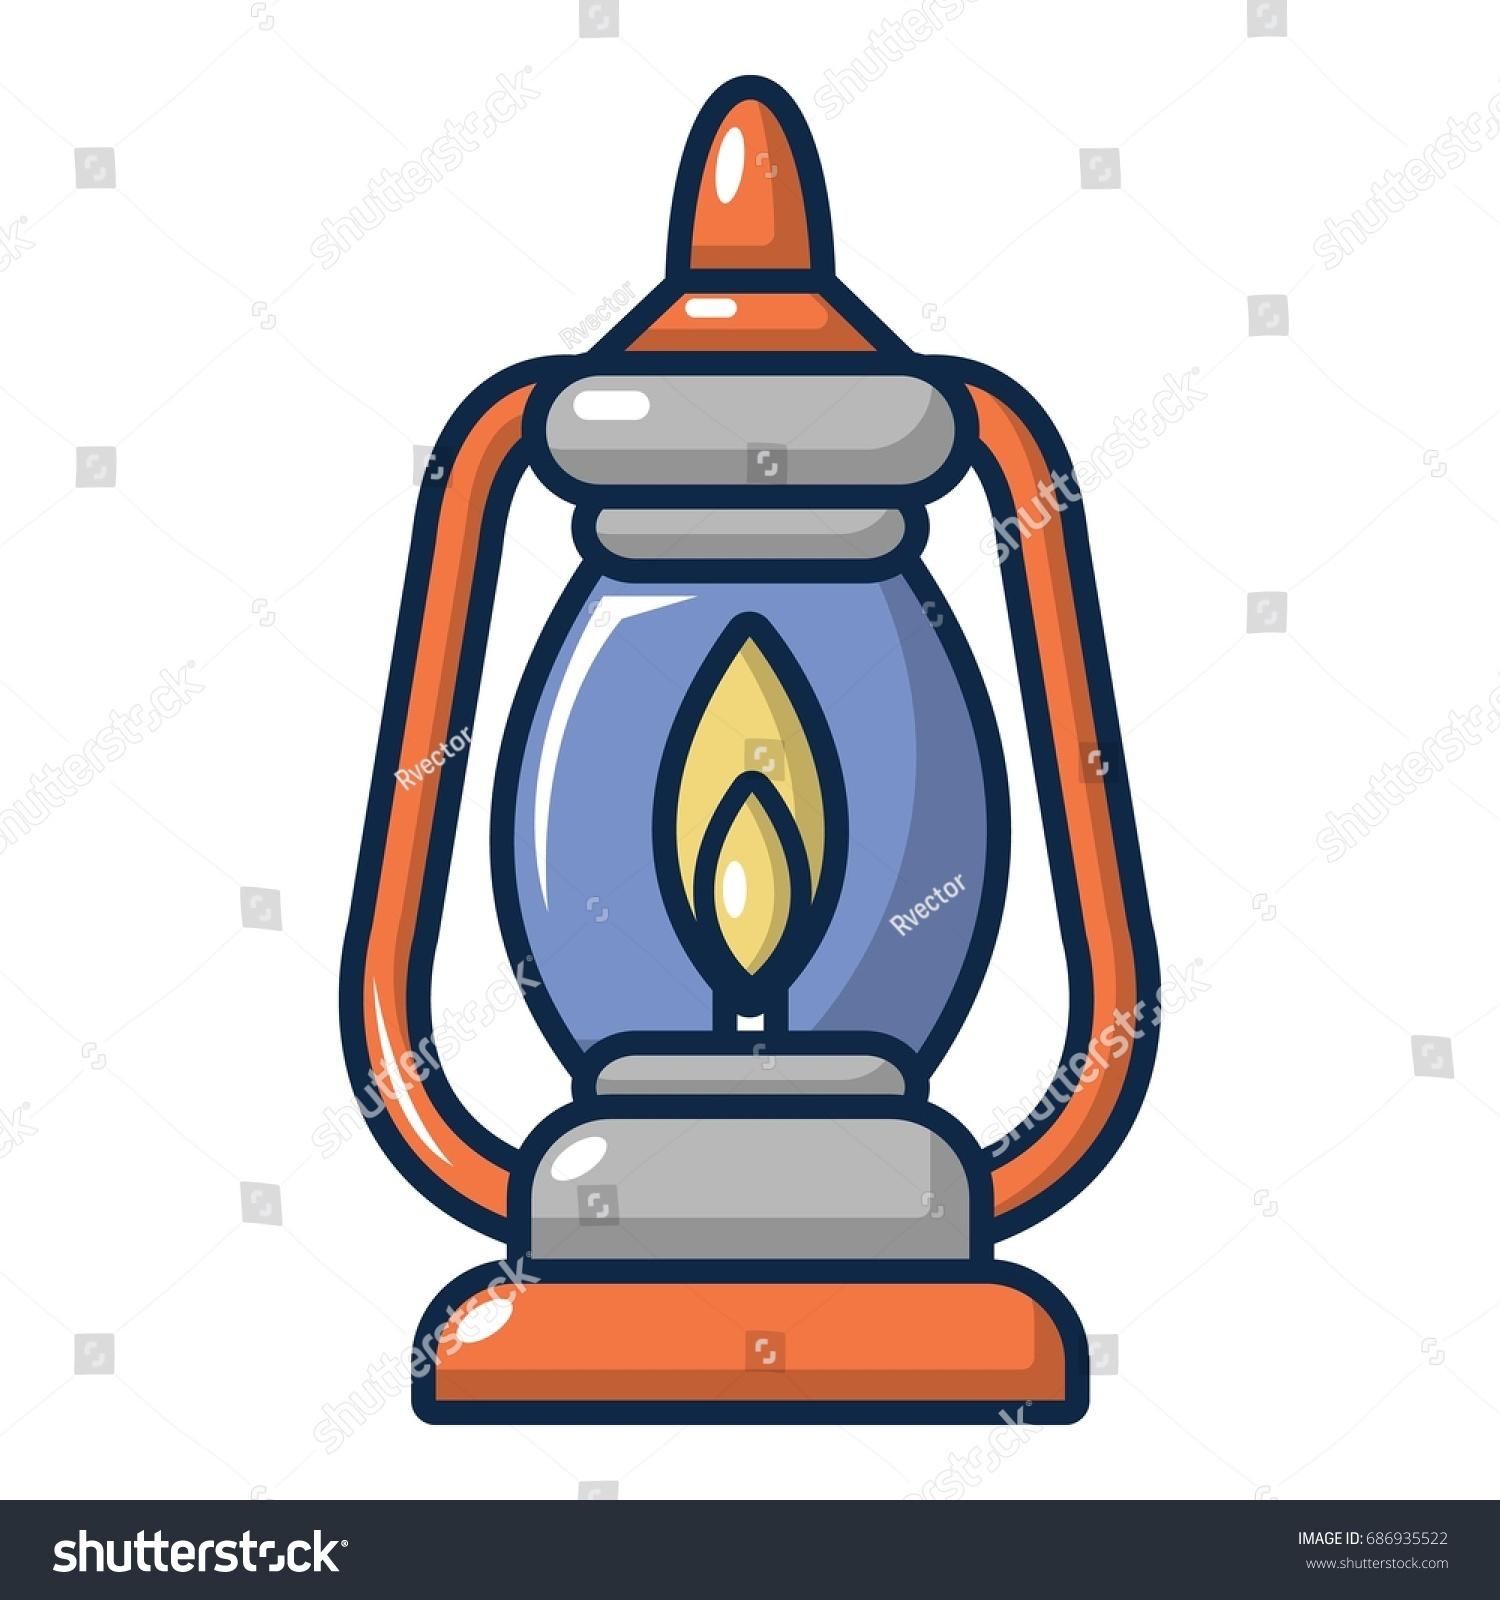 Kerosene Lamp Icon Cartoon Illustration Kerosene Stock Photo (Photo ... for Kerosene Lamp Clipart  585eri